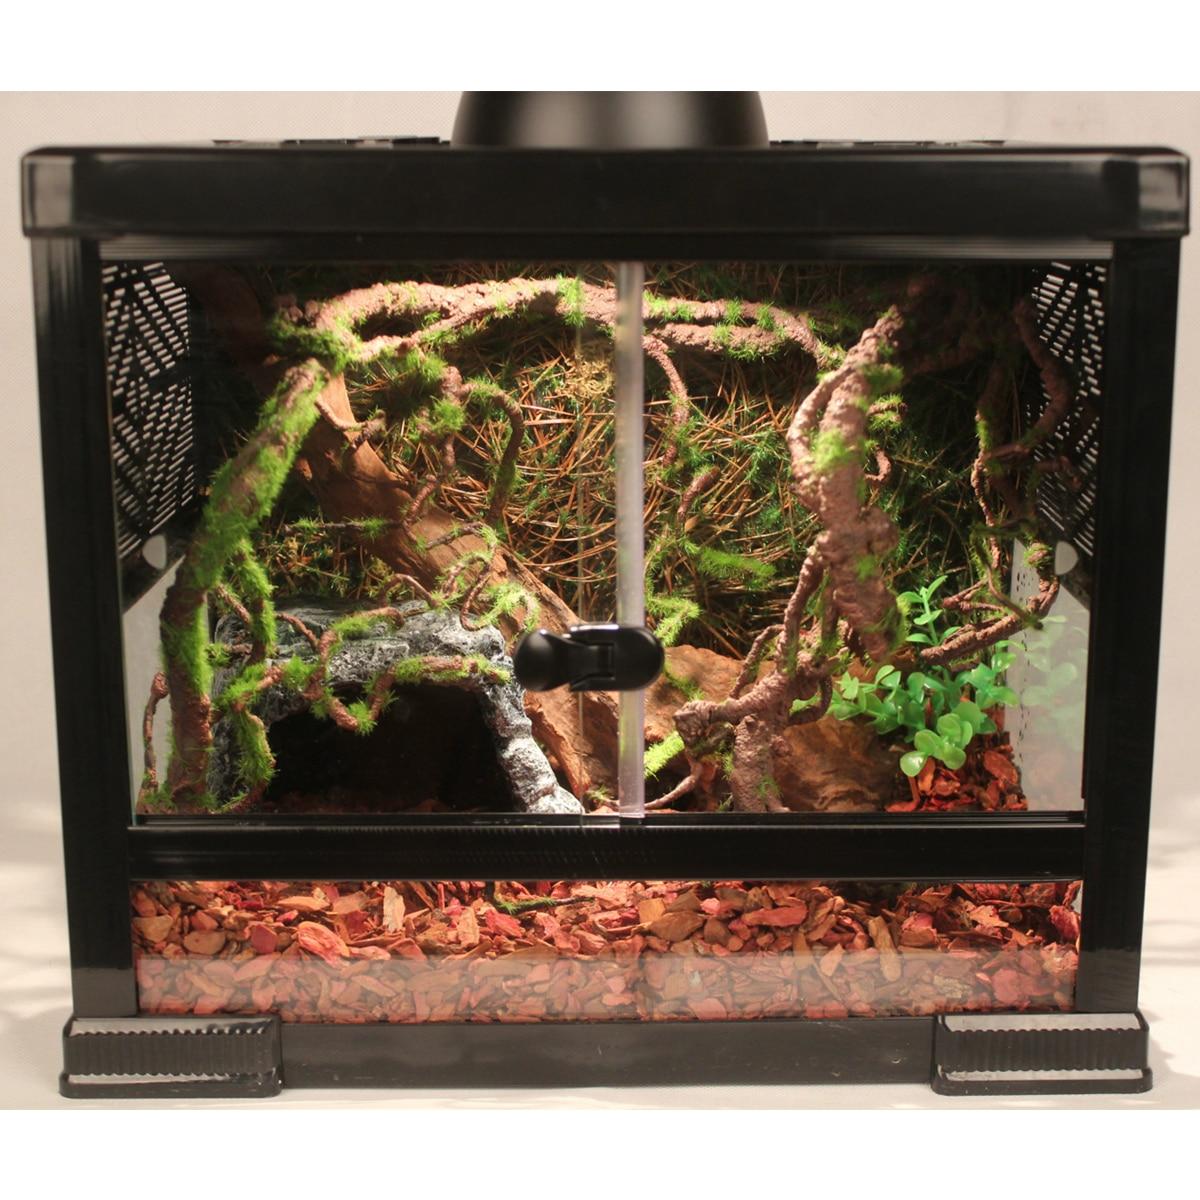 Pet Reptiles Tank Vine Climber Jungle Forest Bend Artificial Branch